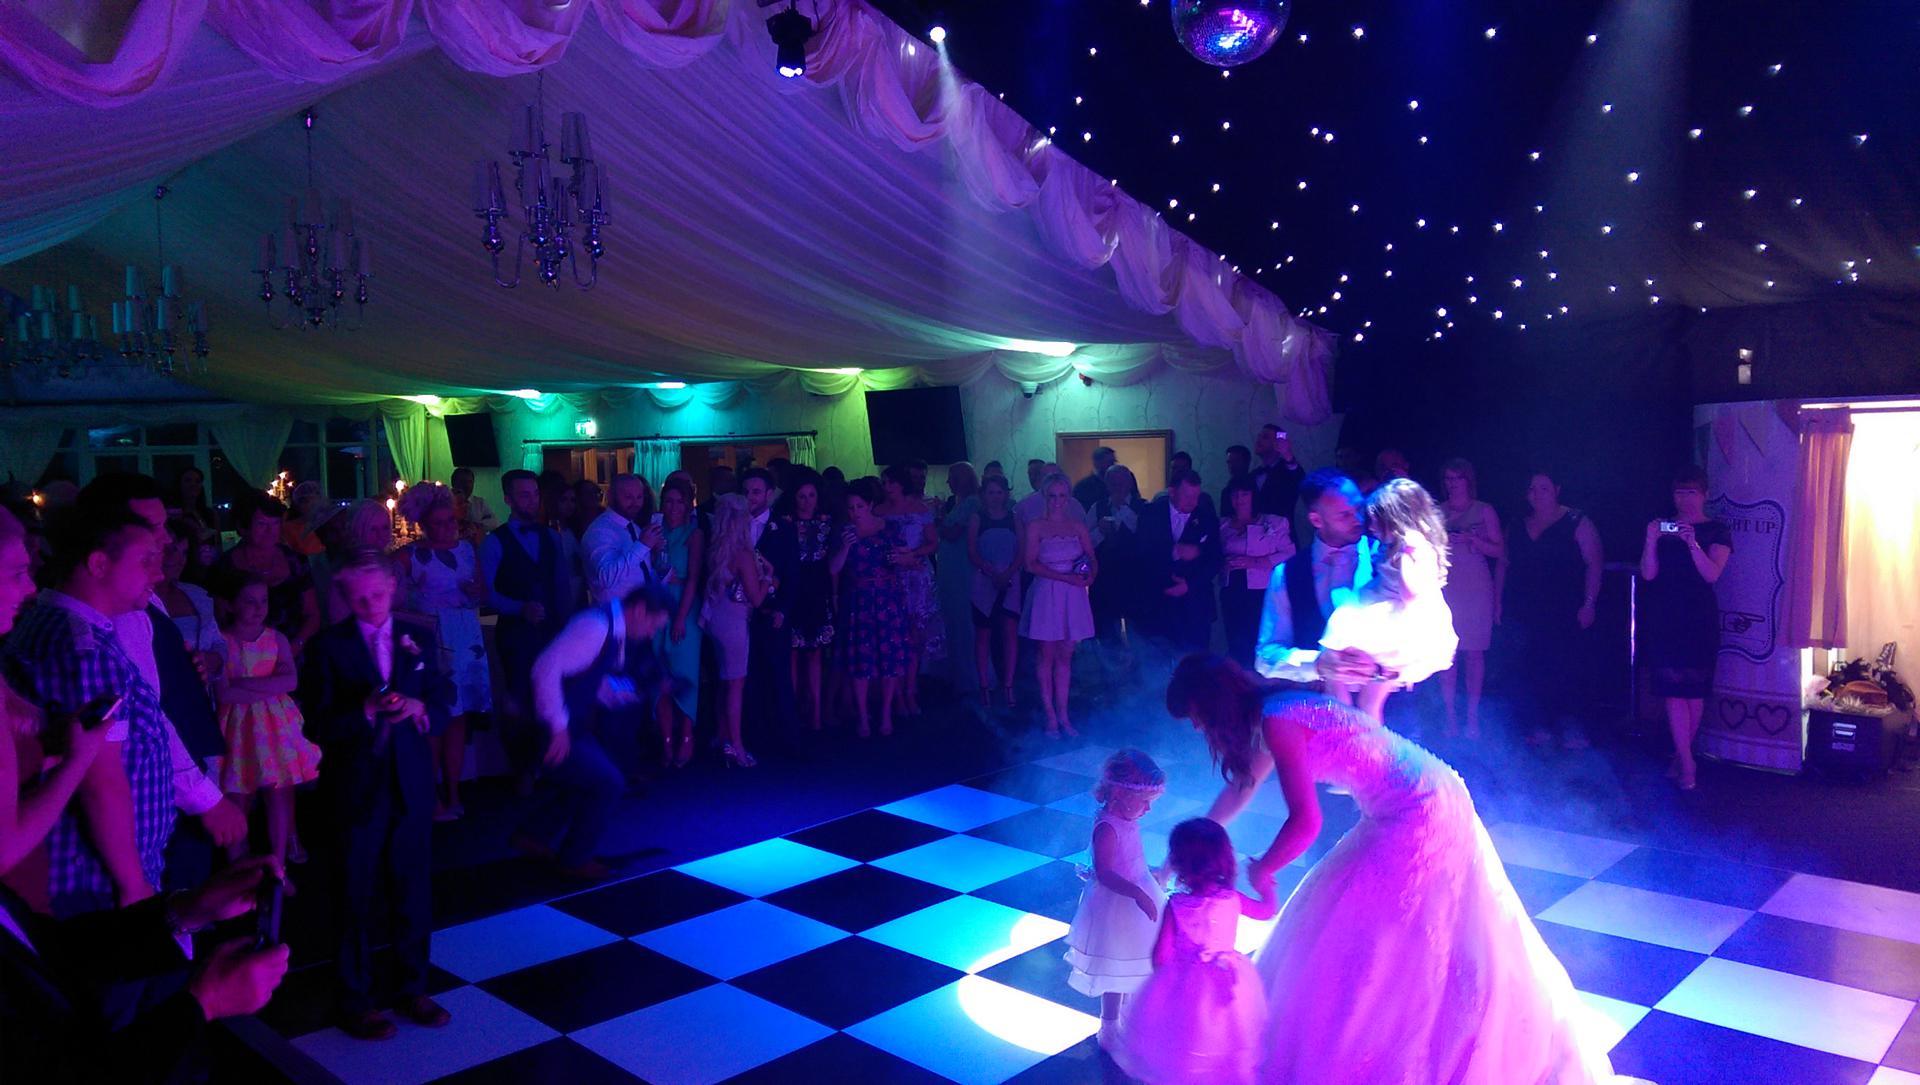 Obsession_entertainment_wedding_photography_wedding_dj_wedding_disco_drapes_lighting_equipment_higher_childrens_party-0053